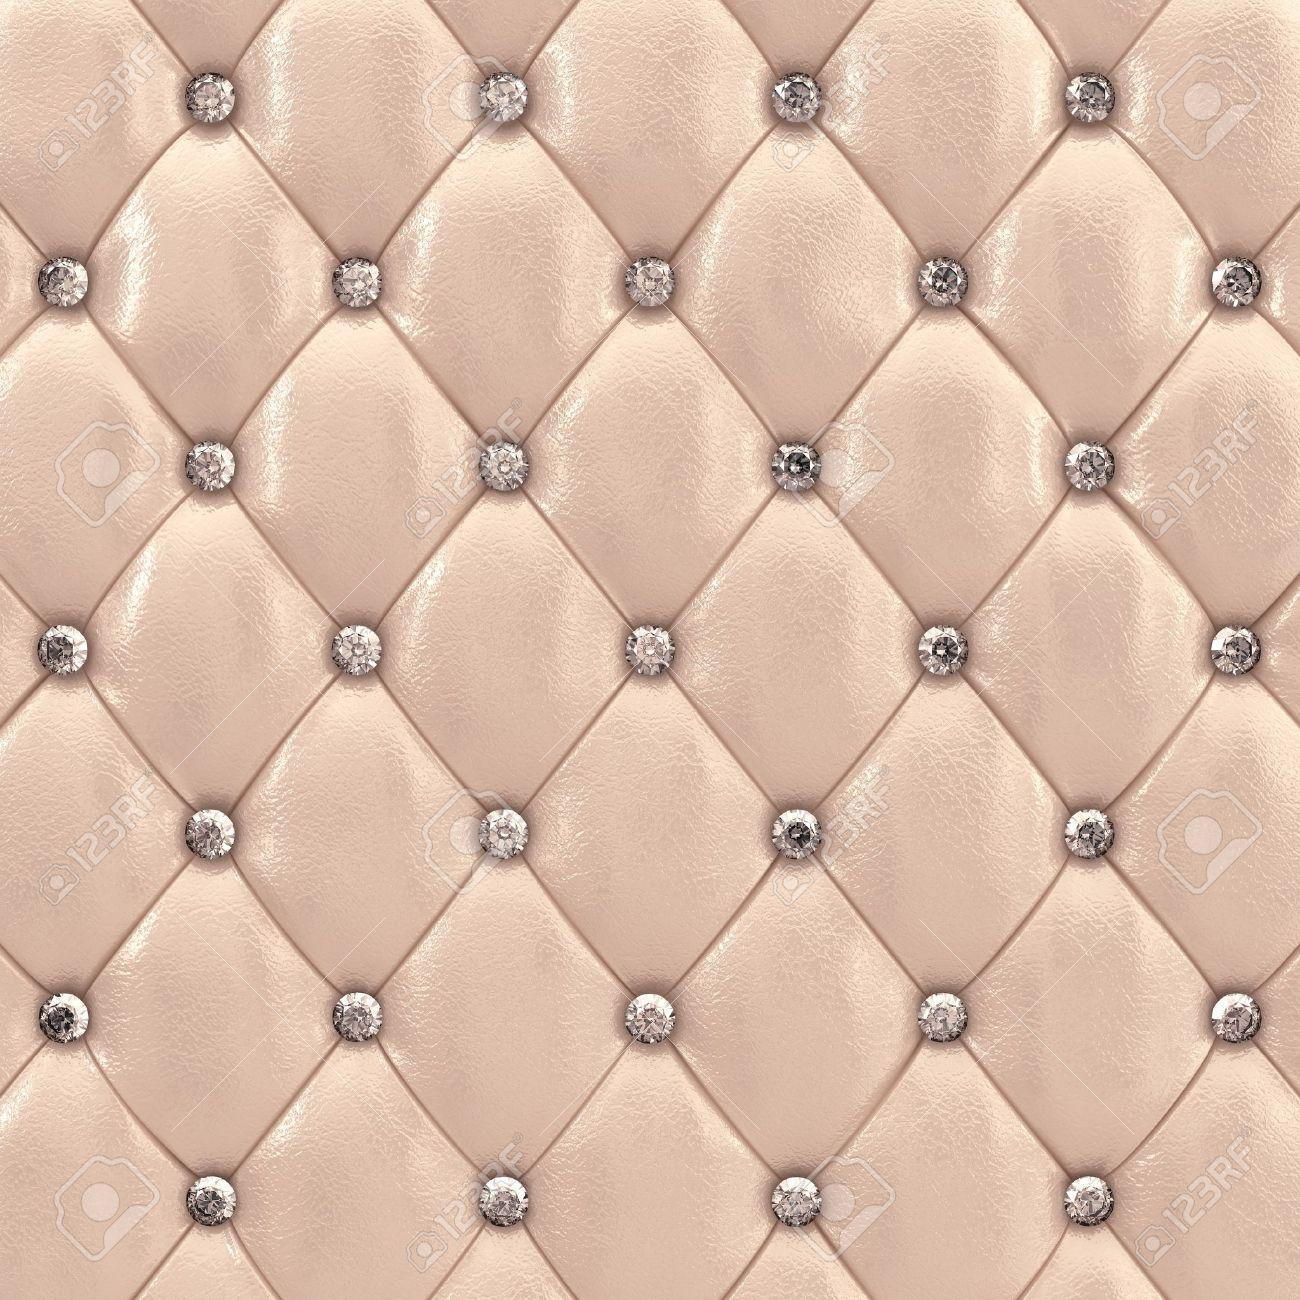 Beige upholstery pattern with diamonds , 3d illustration Stock Illustration - 10746265